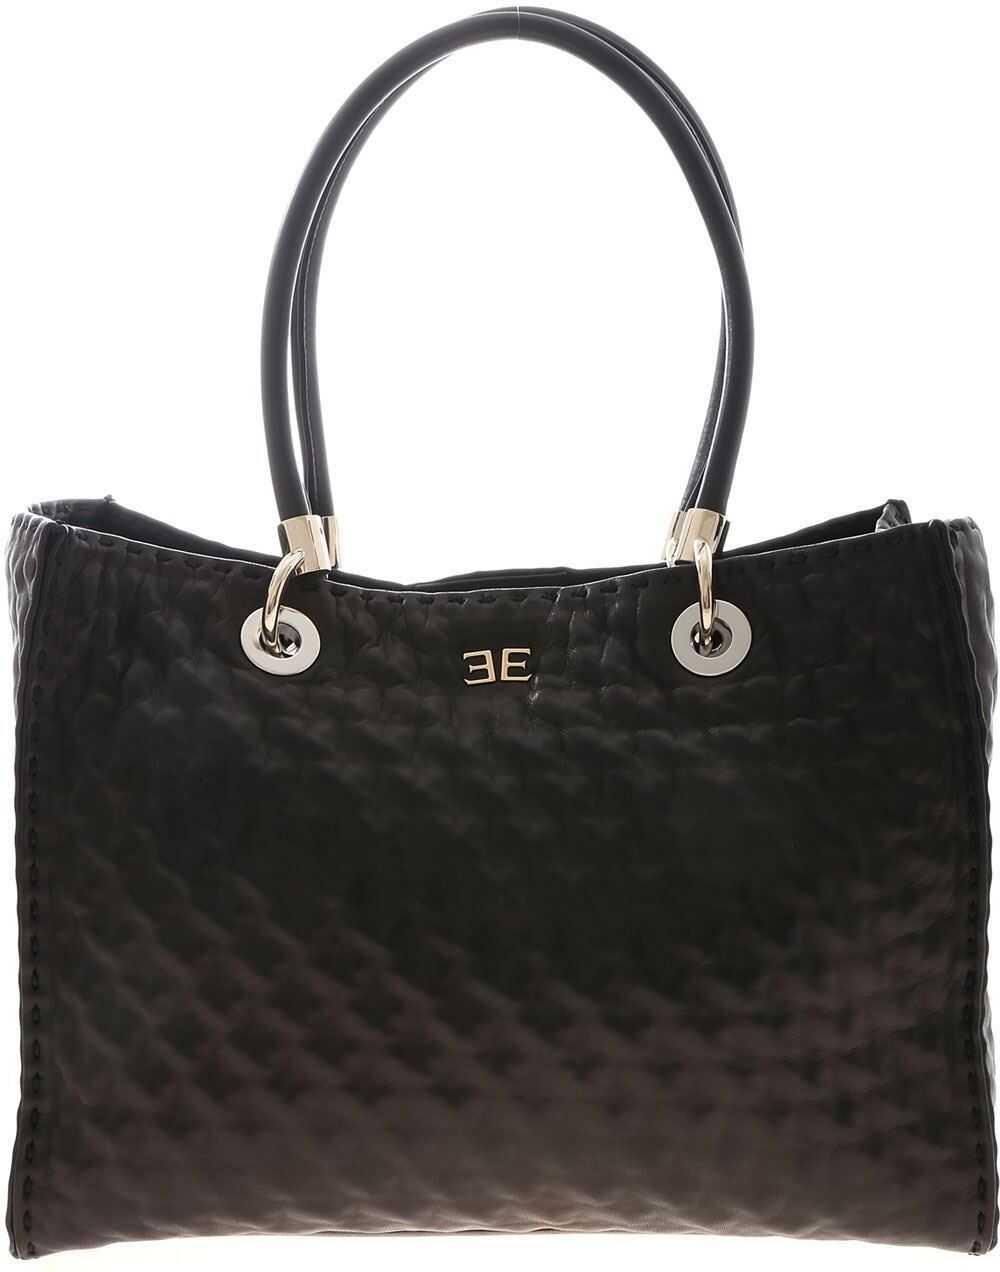 Ermanno Scervino Medium Shopping Bag In Black D353S305FNA 95708 Black imagine b-mall.ro